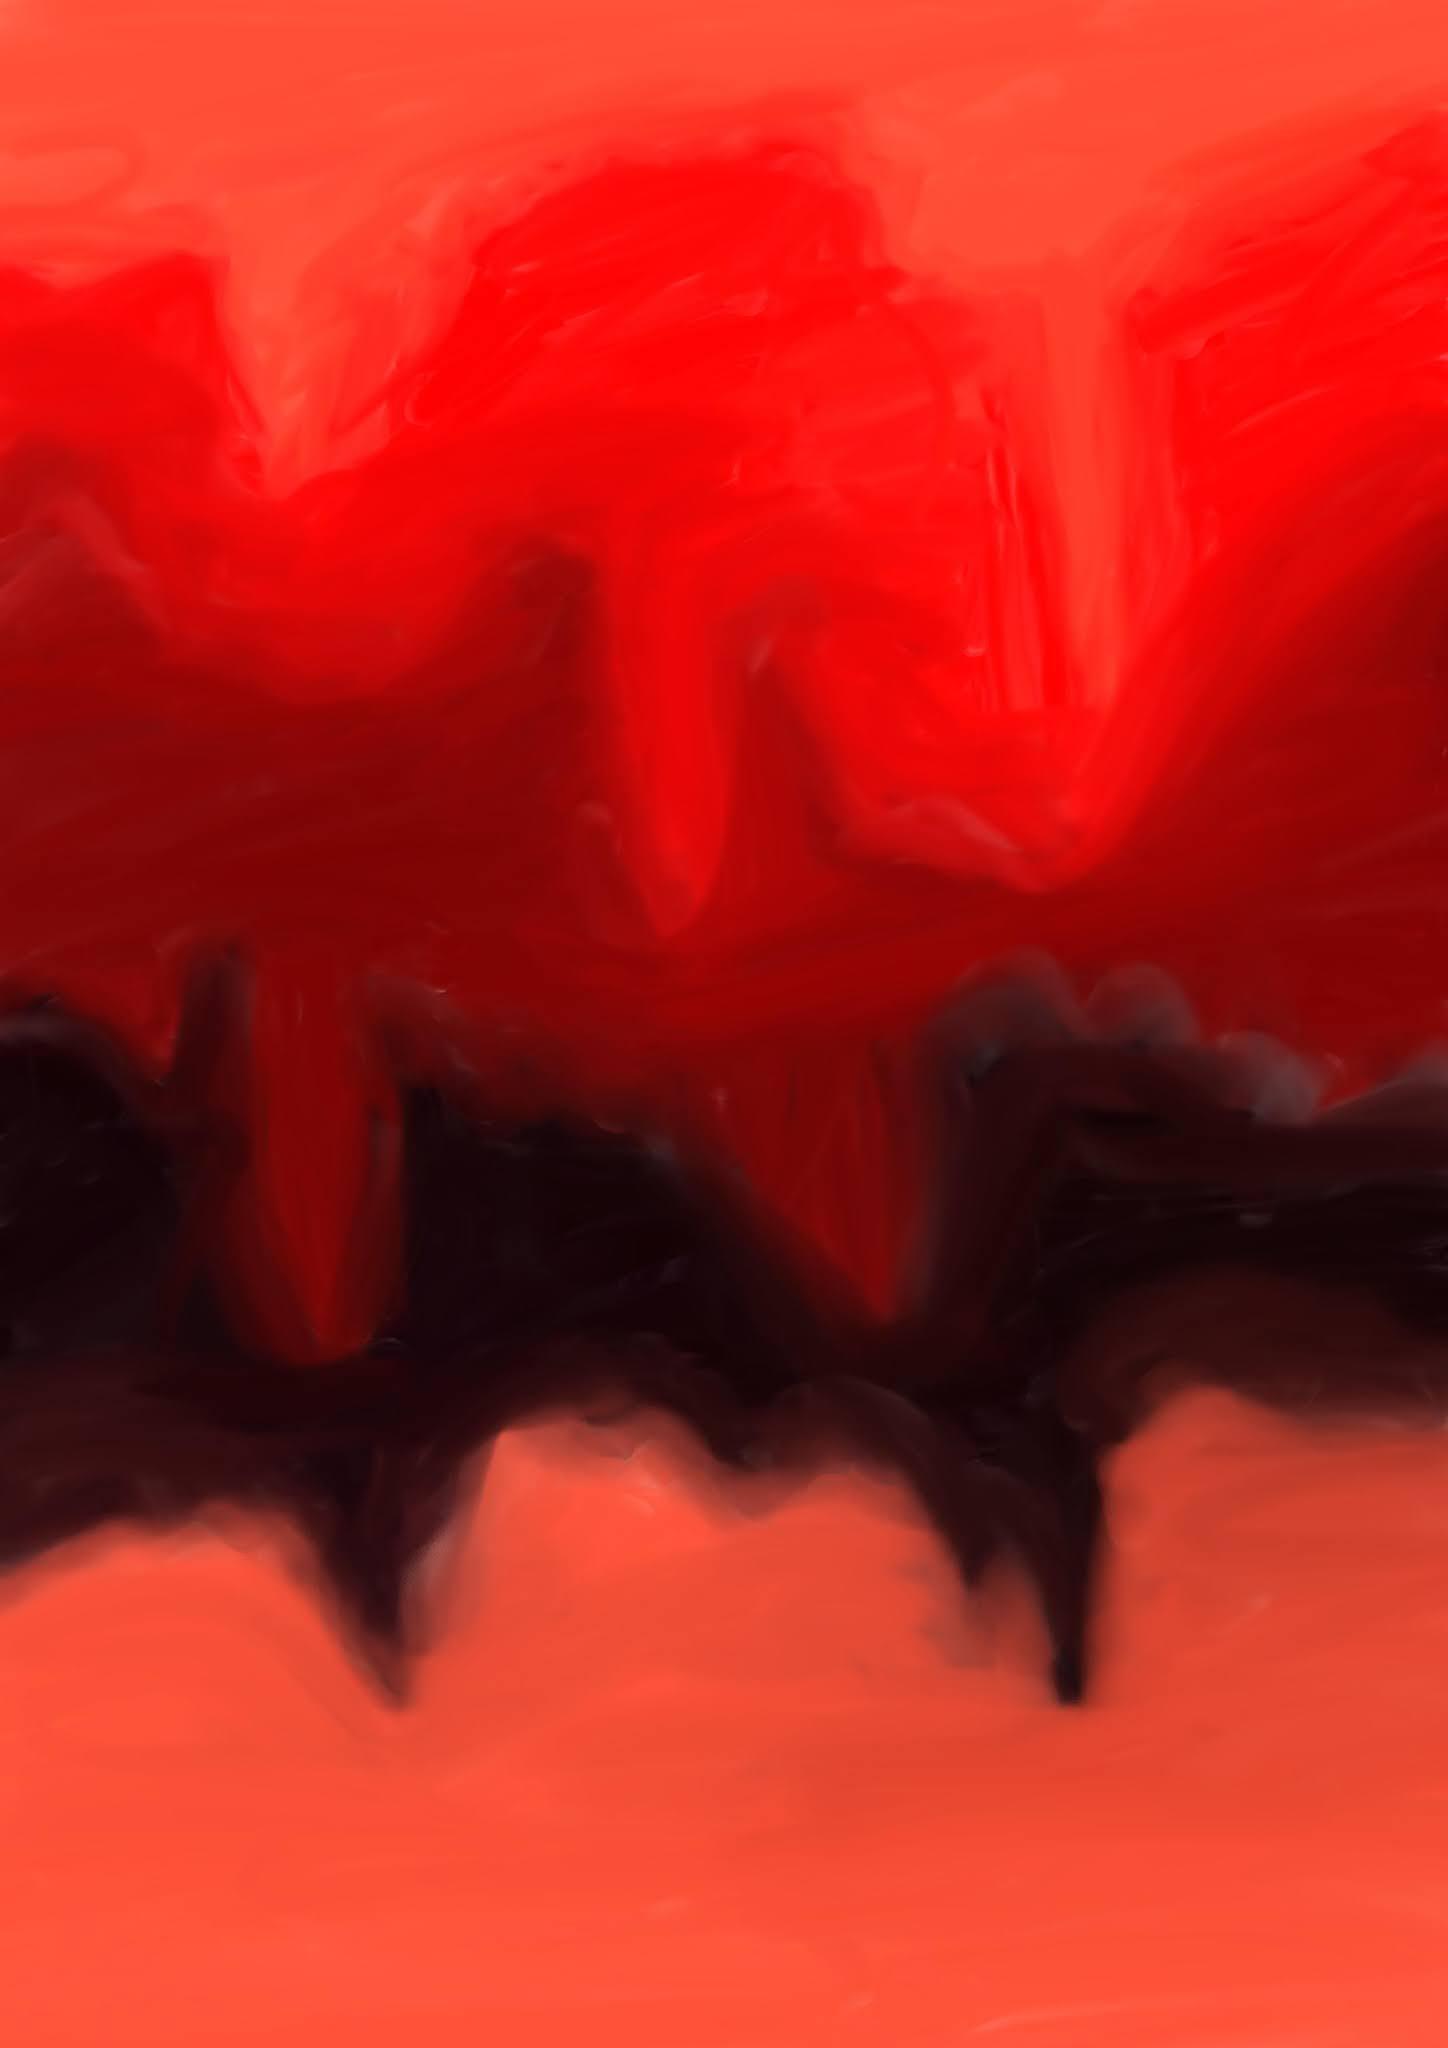 DIY Abstract painting and Digital Art tutorial